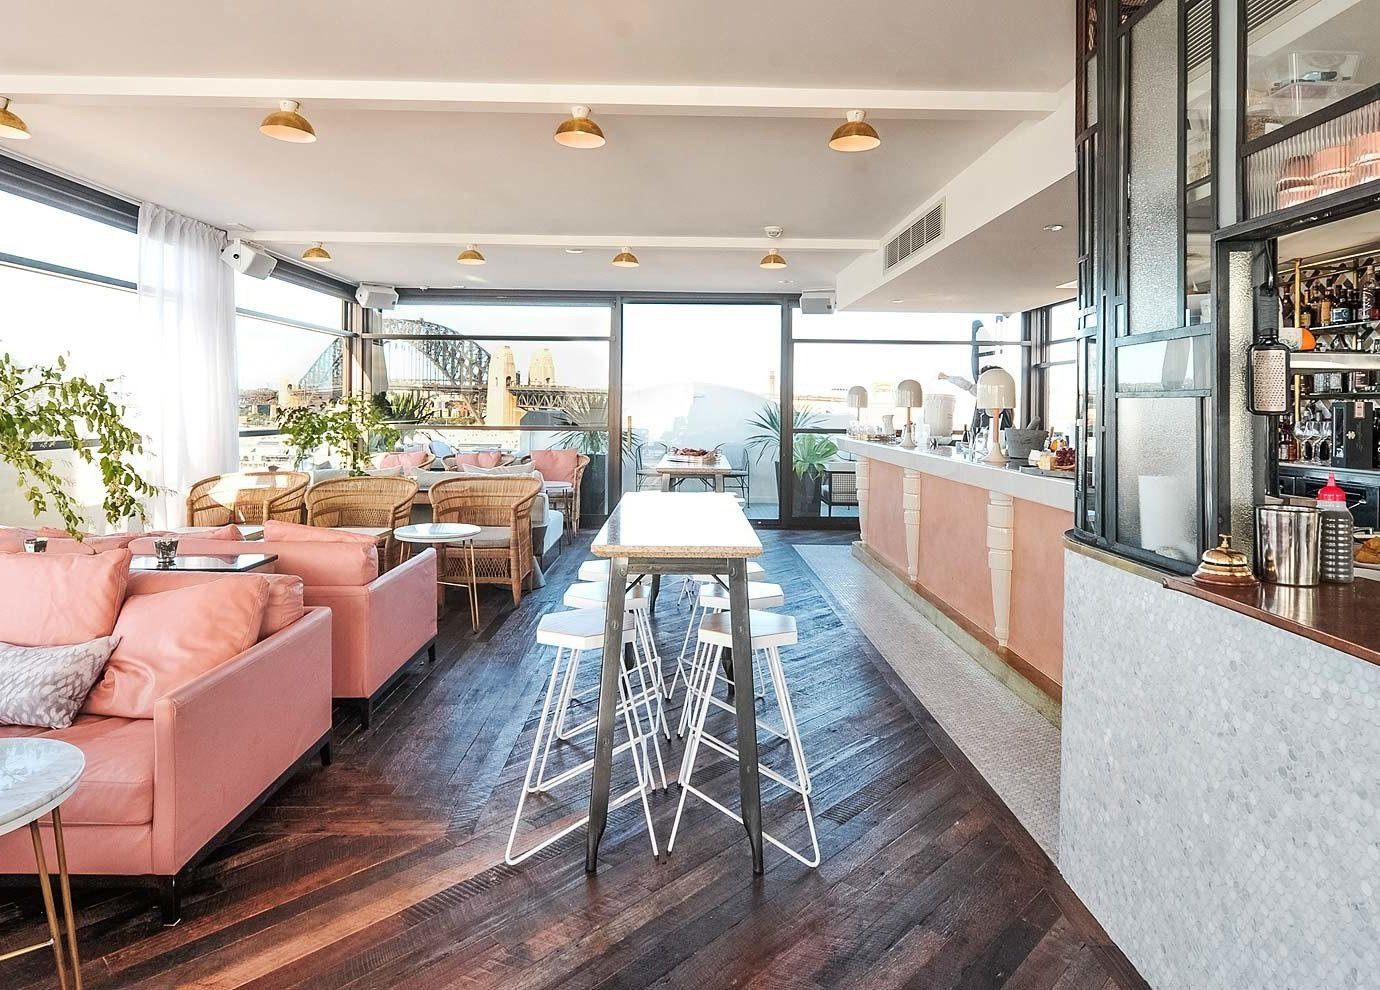 Hotels floor indoor property room Living ceiling real estate Lobby estate restaurant interior design furniture meal area